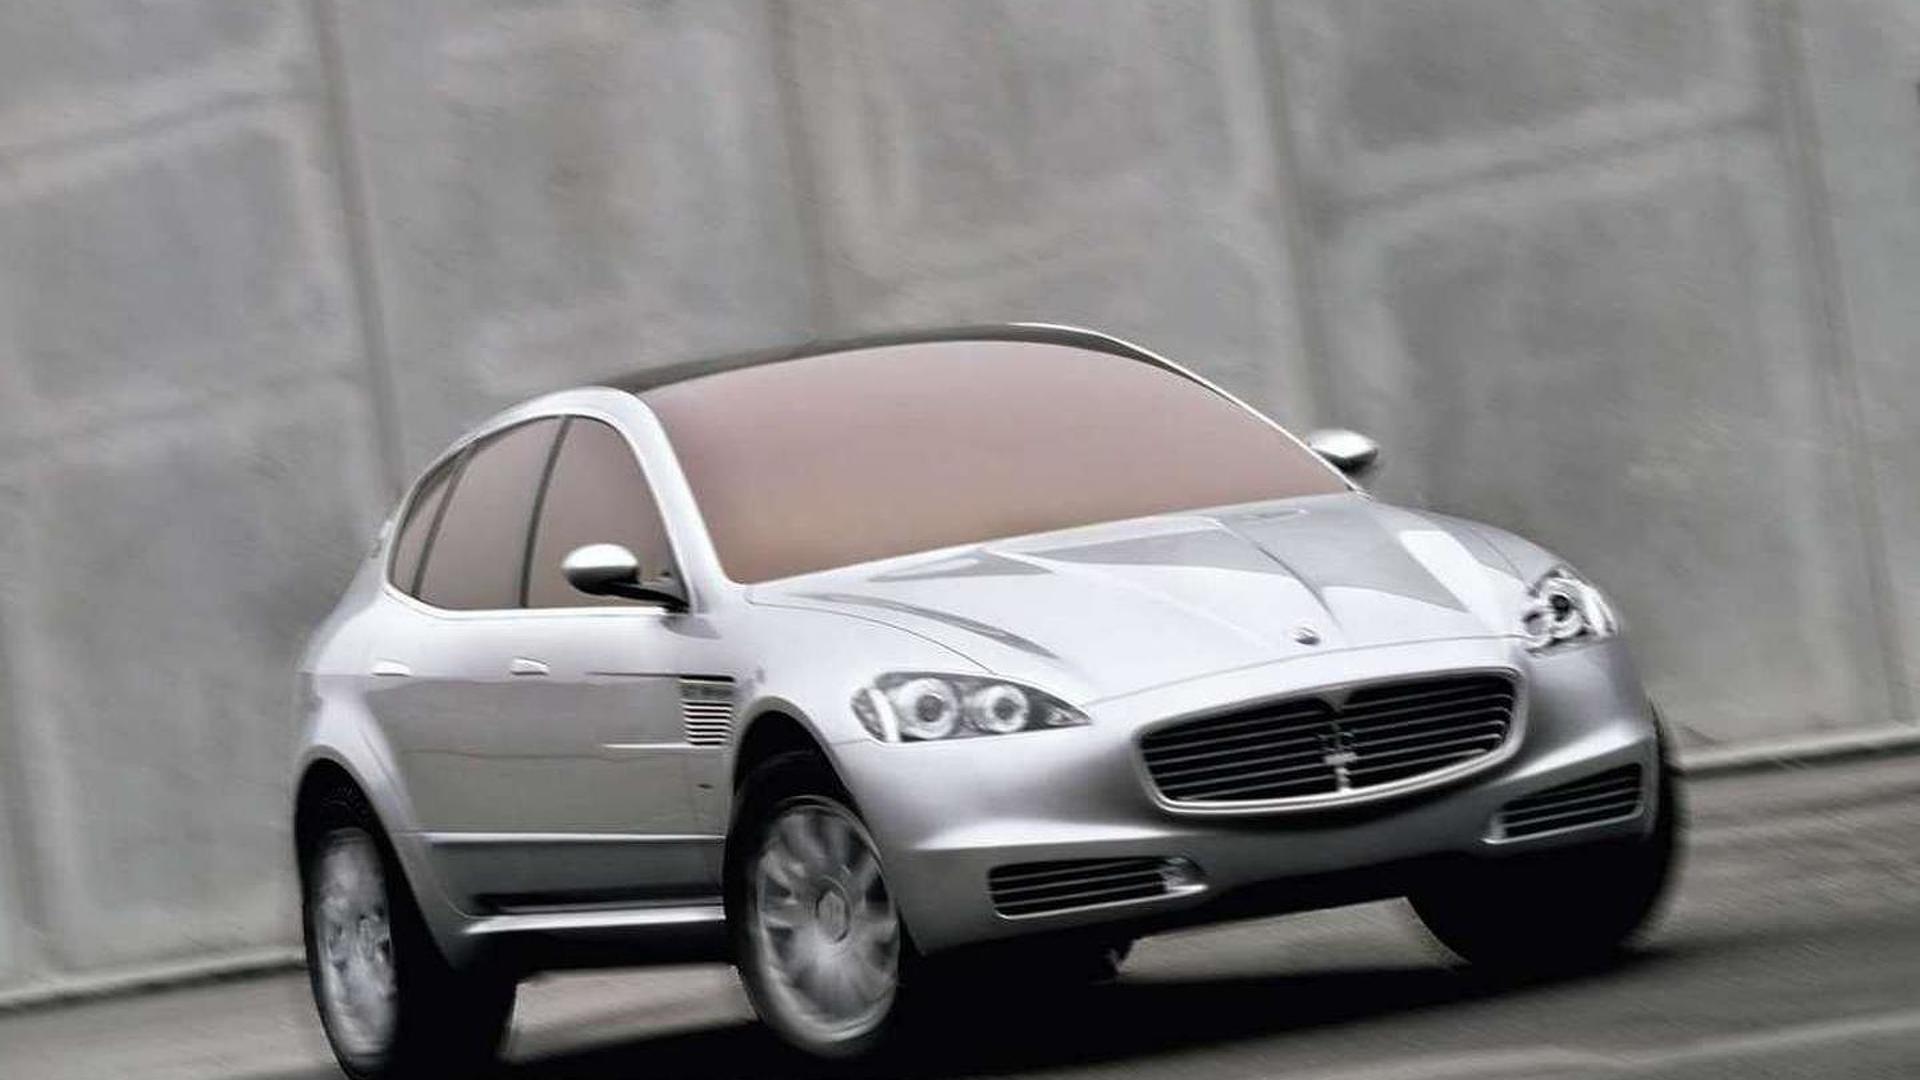 https://icdn-0.motor1.com/images/mgl/Ew0nz/s1/2010-215509-maserati-kubang-gt-wagon-concept-20031.jpg